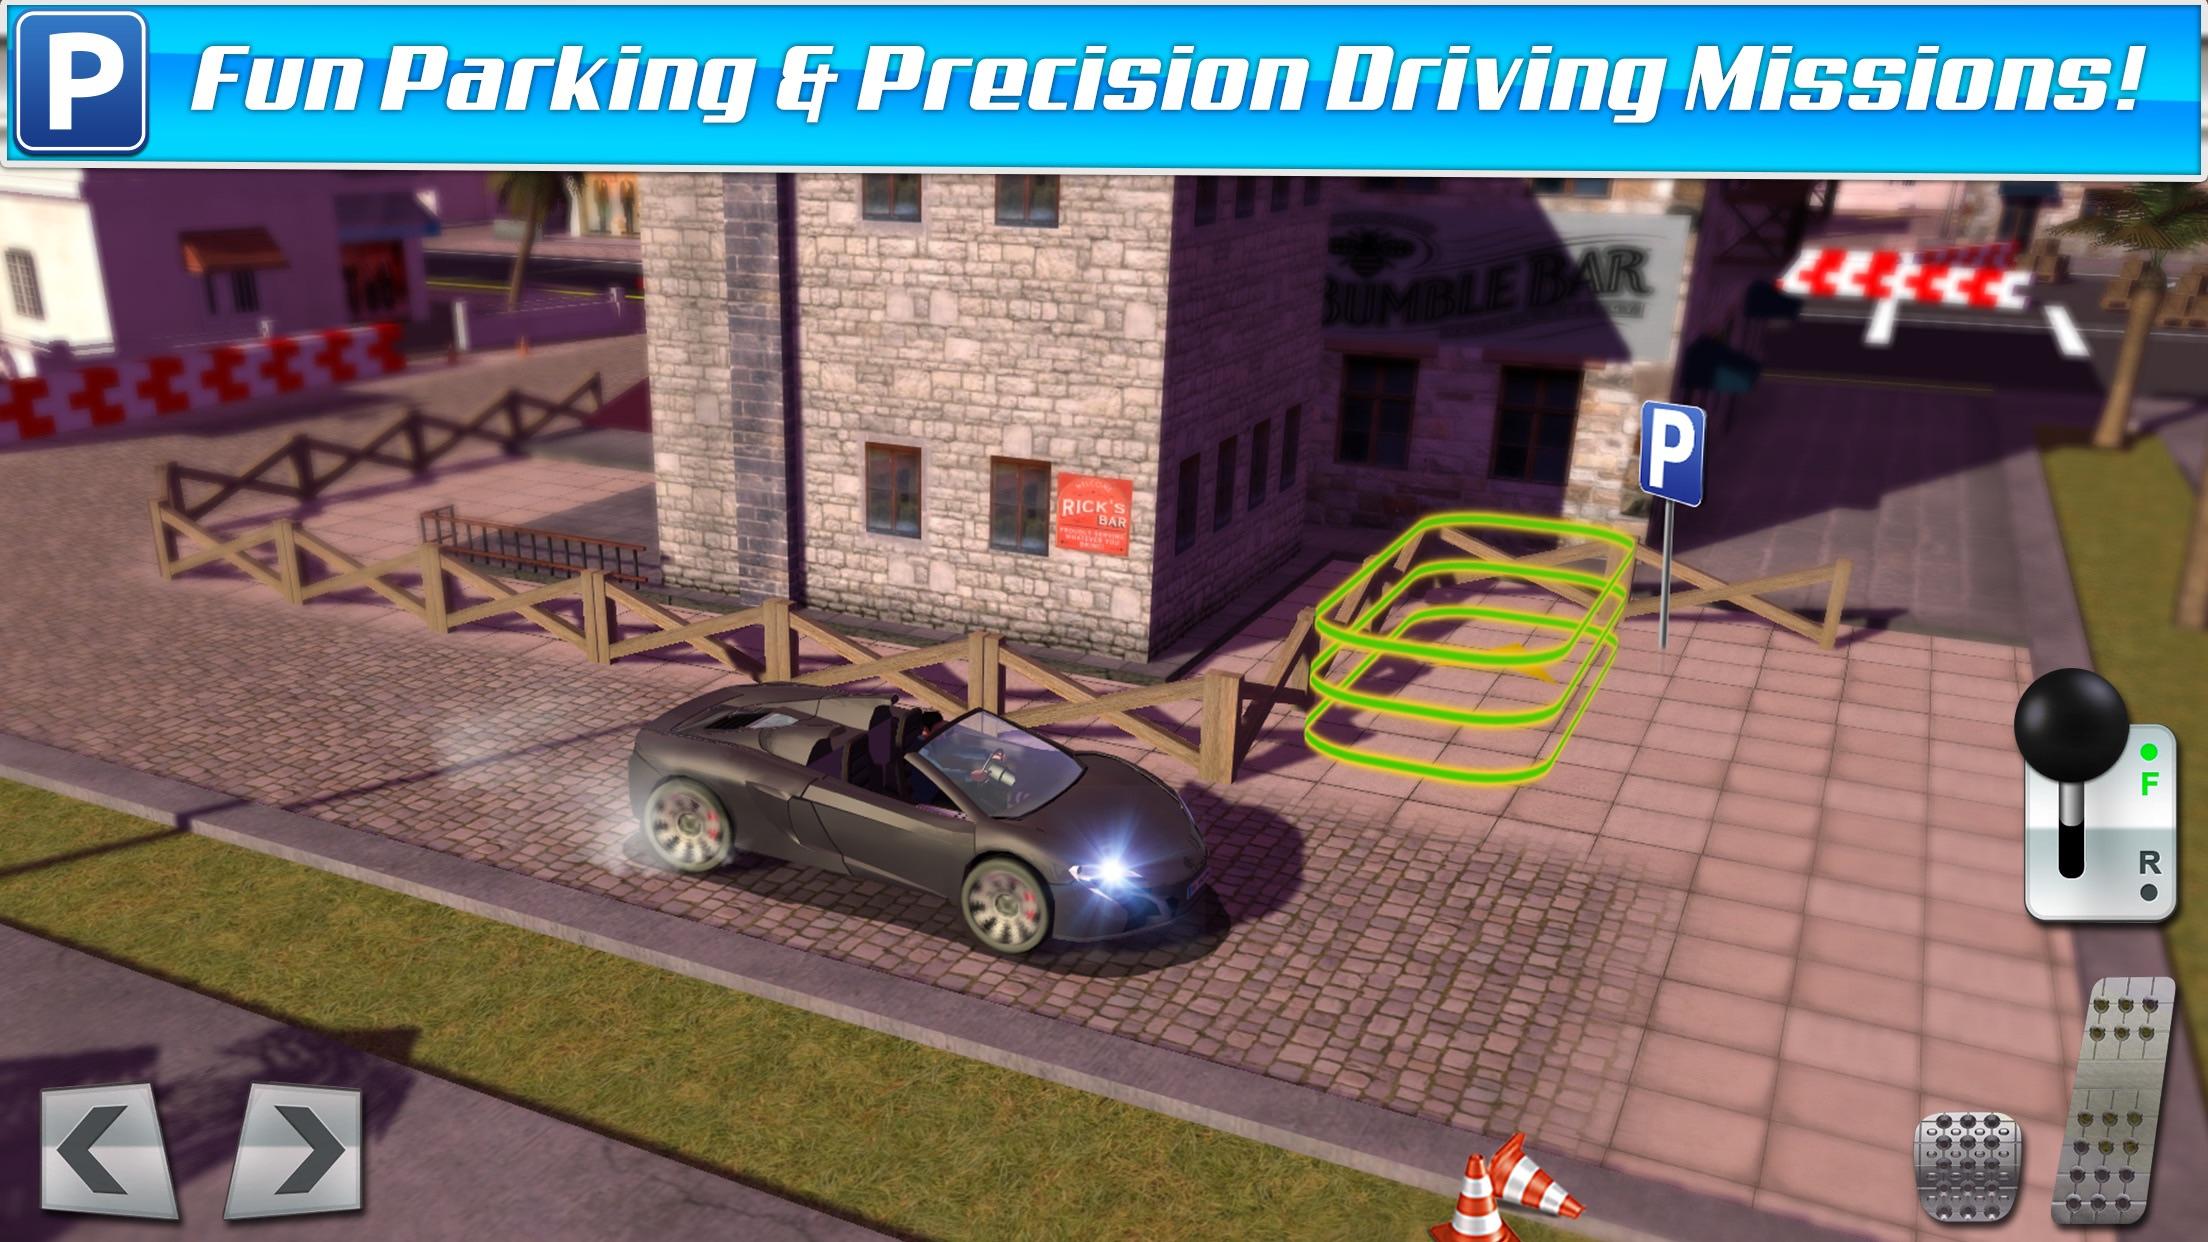 Classic Sports Car Parking Game Real Driving Test Run Racing Screenshot